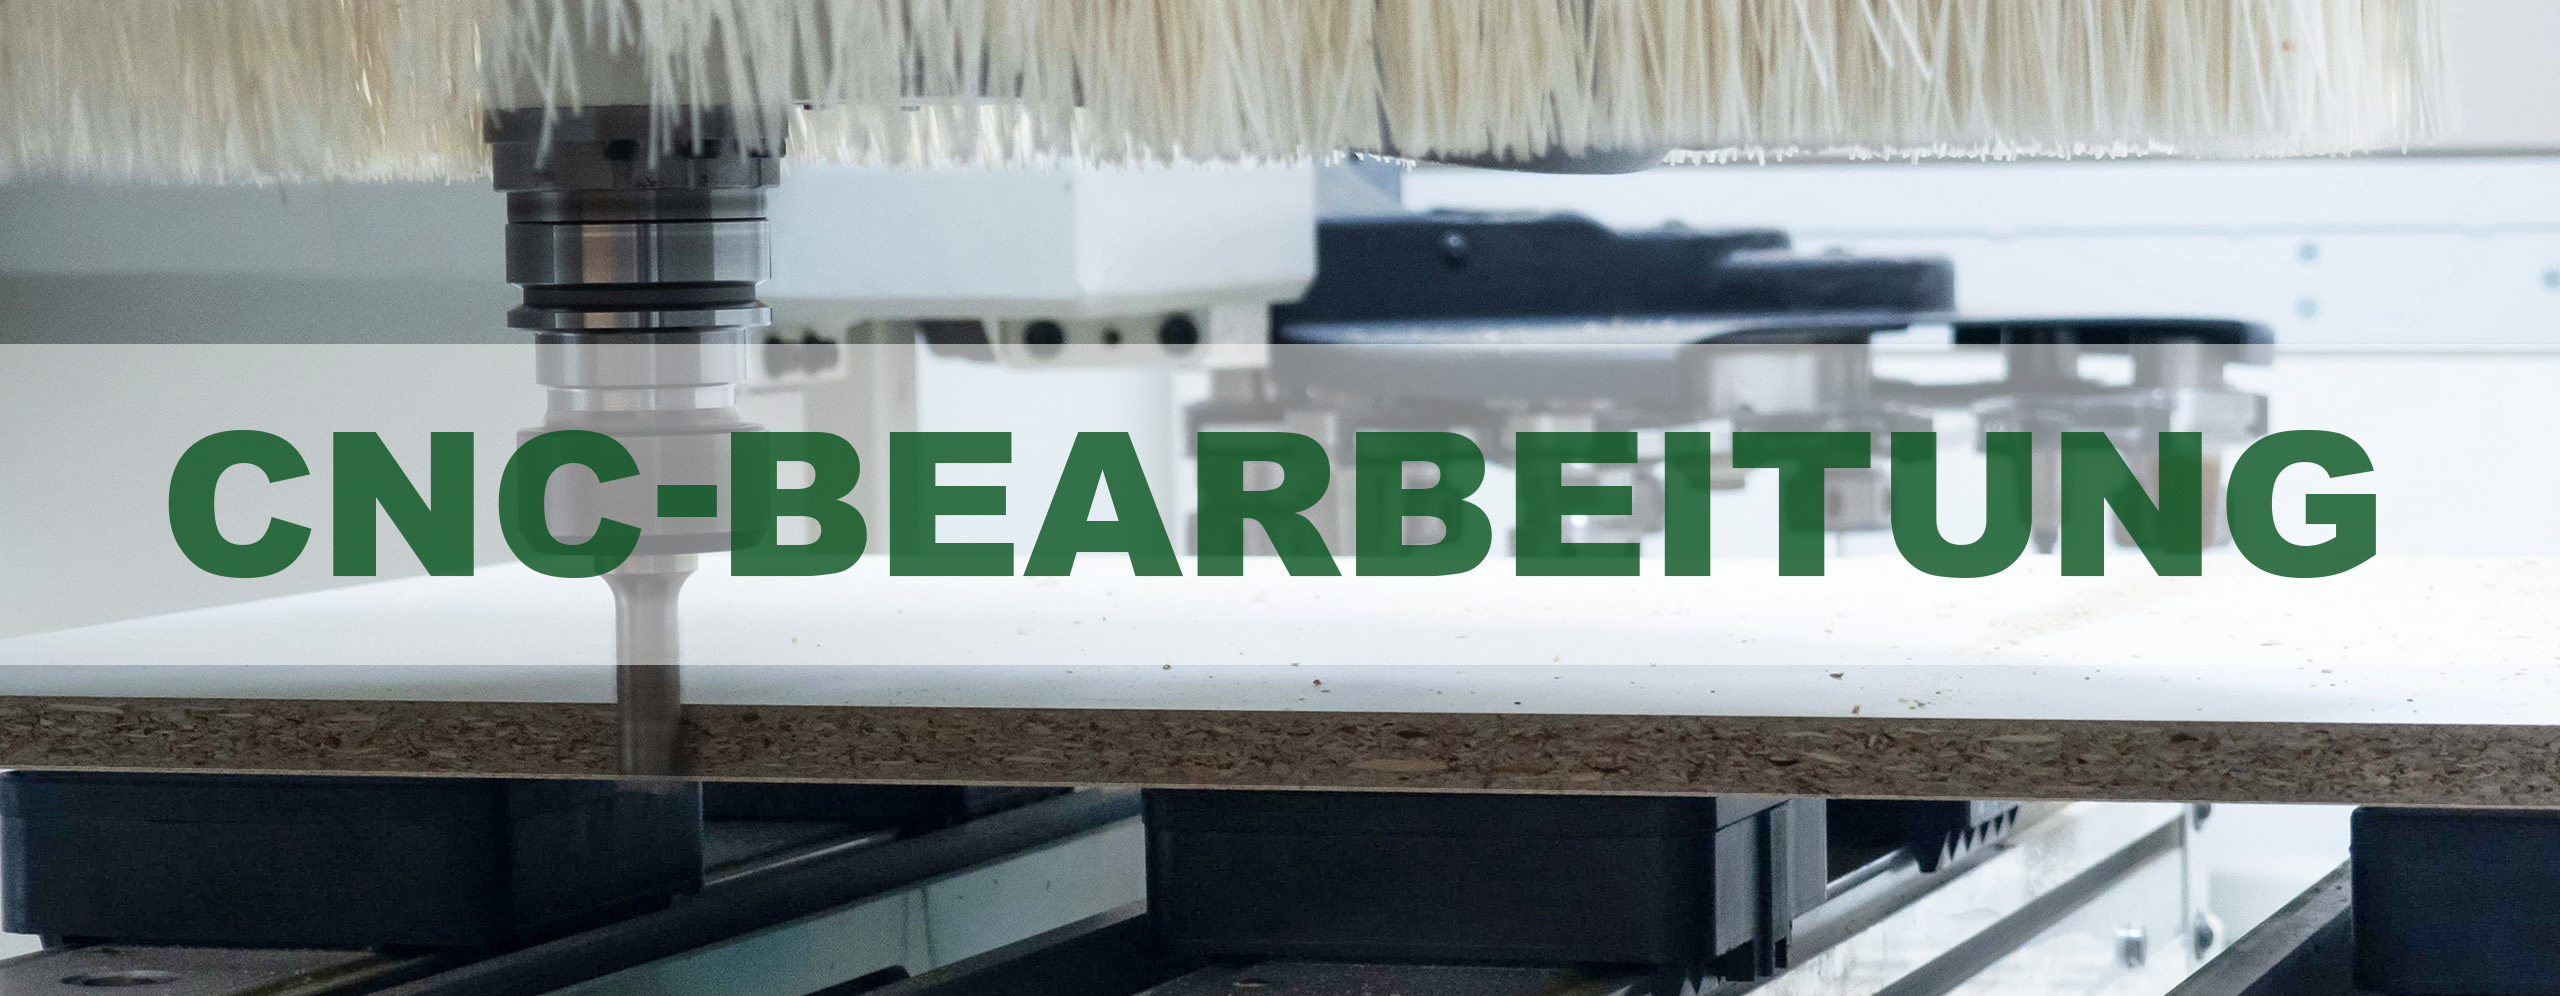 CNC-Bearbeitung-Home